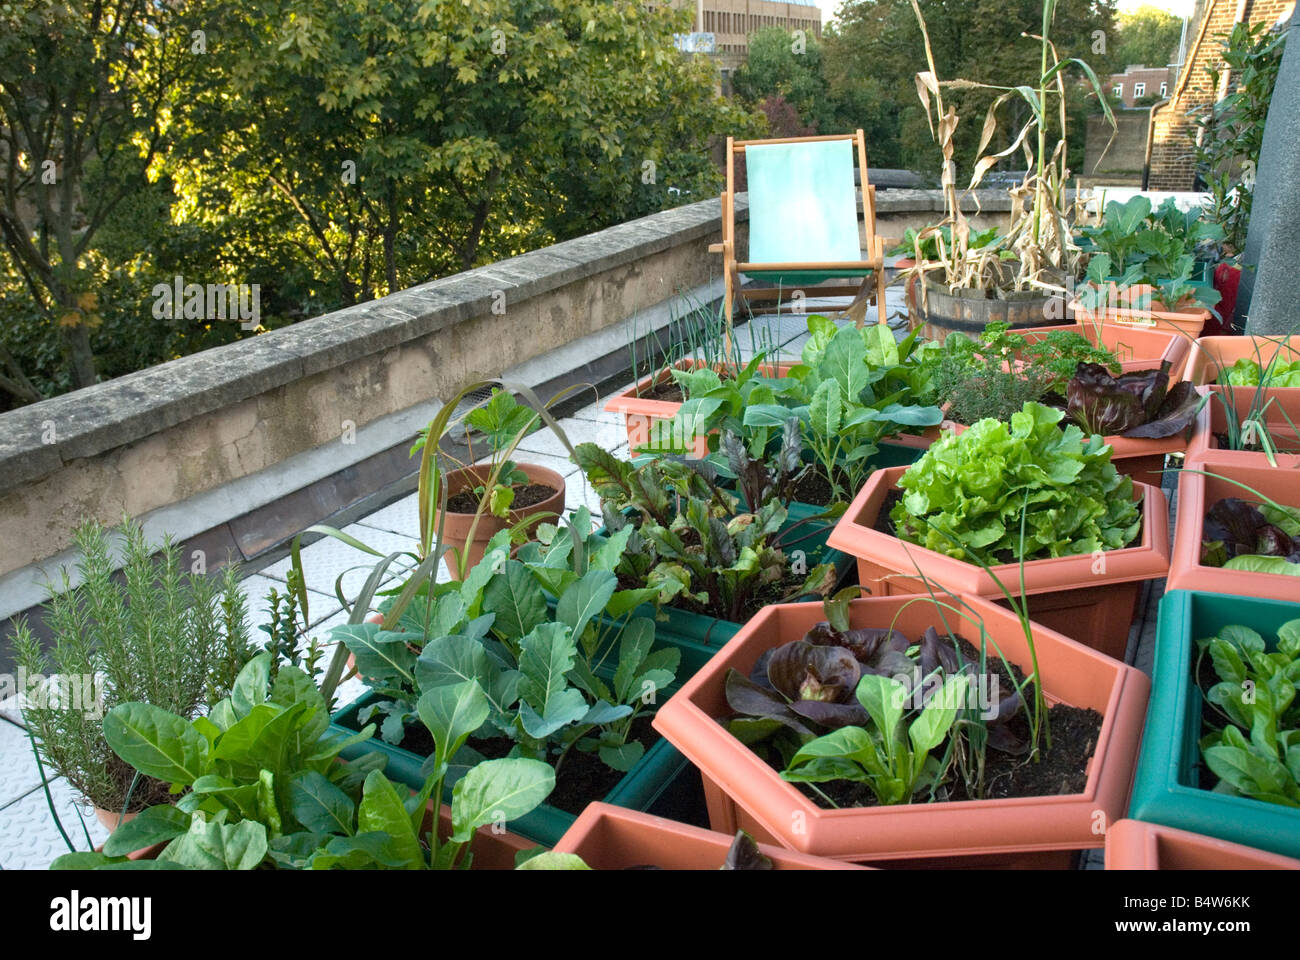 Vegetables Growing On Urban Rooftop London Urban Veggie Garden